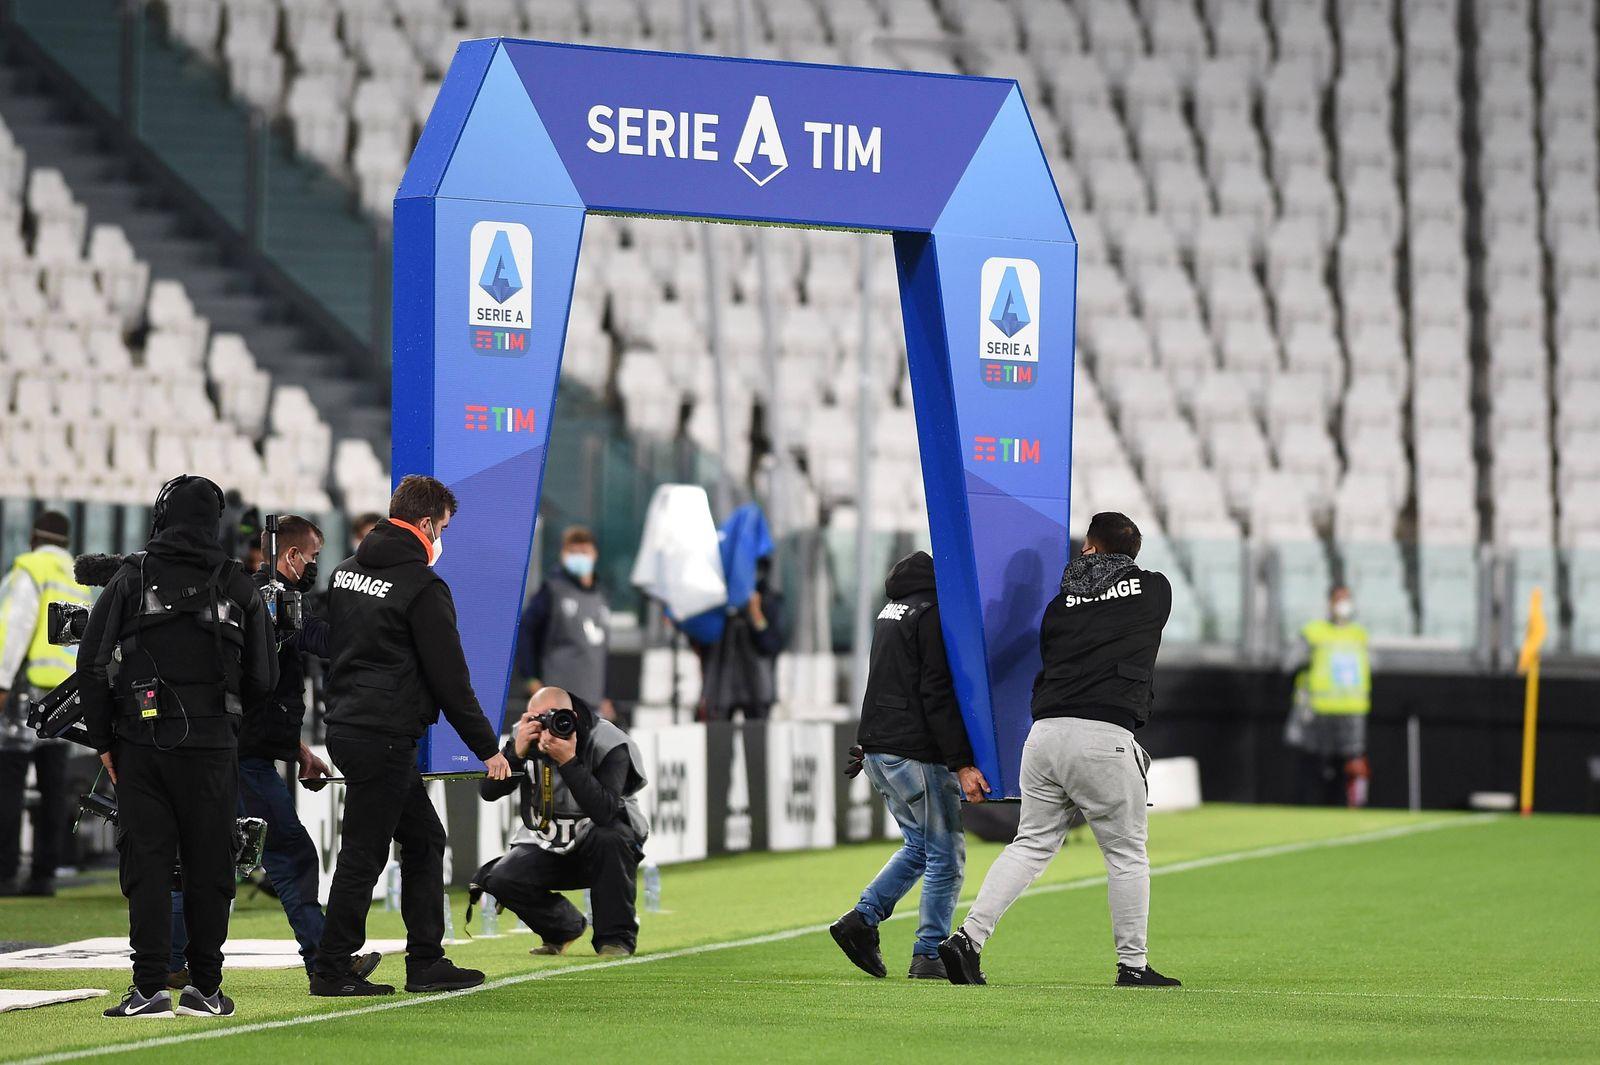 IPP20201004 Football - soccer: Serie A, Juventus Turin - SSC Neapel, il logo lega Serie A (Verwendung nur in Deutschlan